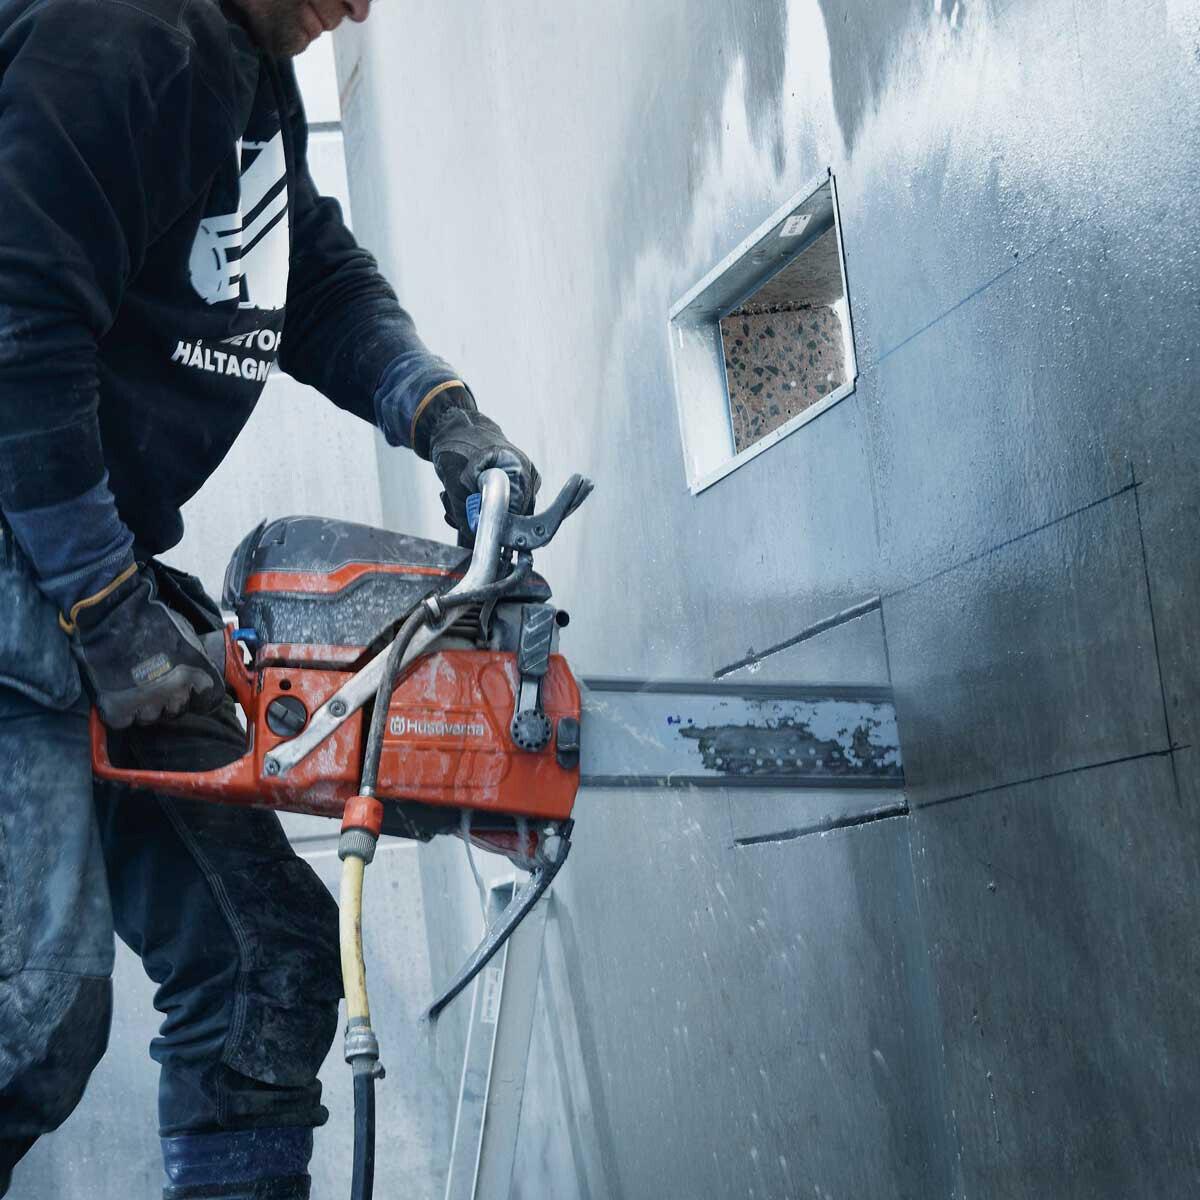 Husqvarna K970 Chain Saw plunge cut